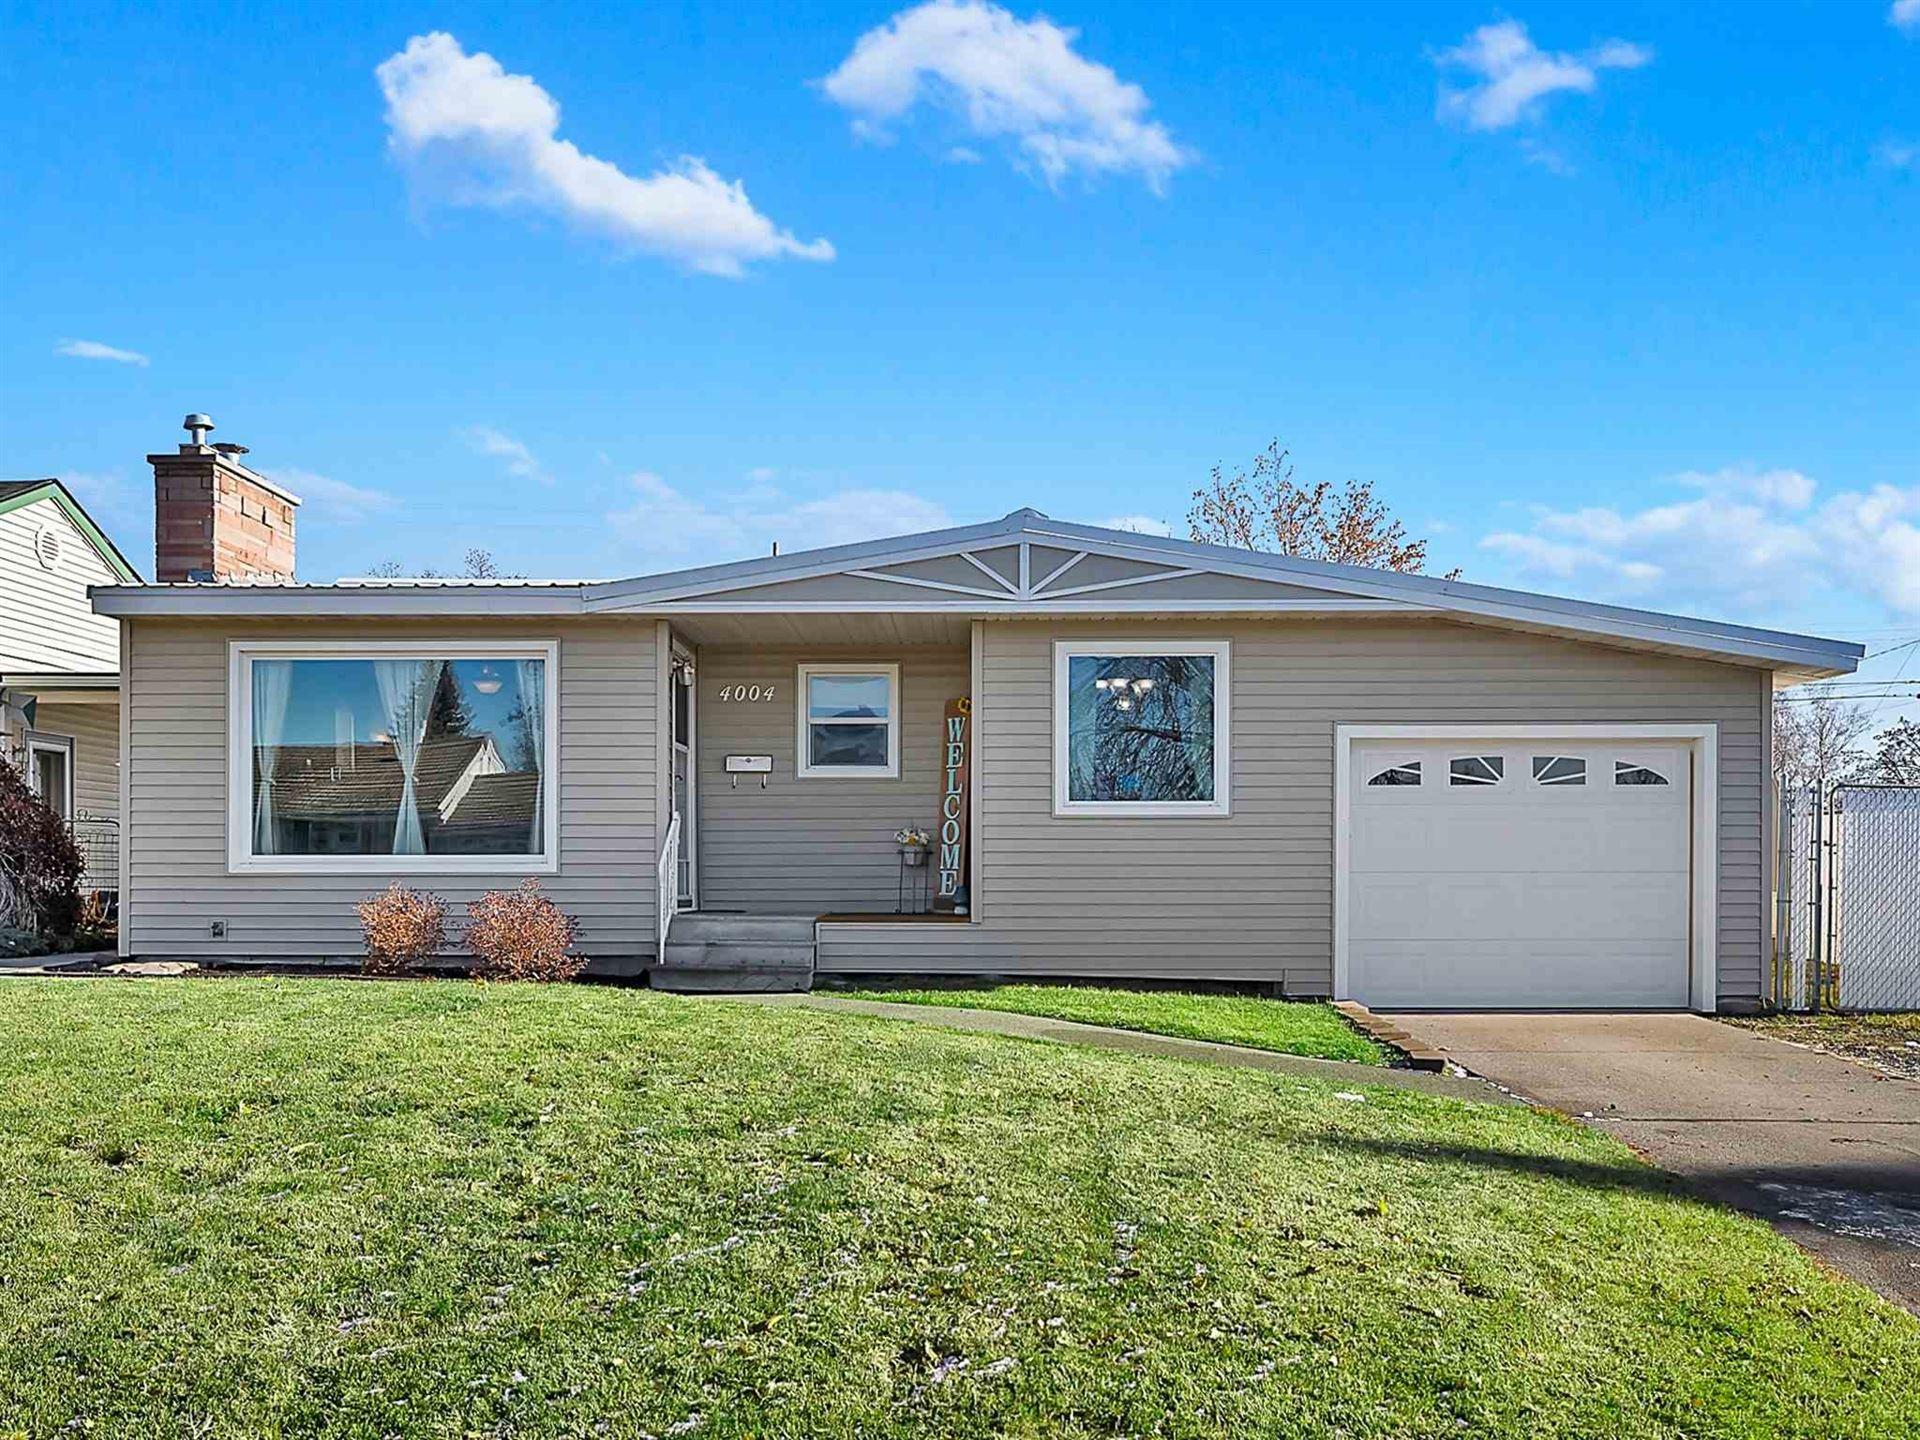 4004 N Elm St, Spokane, WA 99205 - #: 202025363